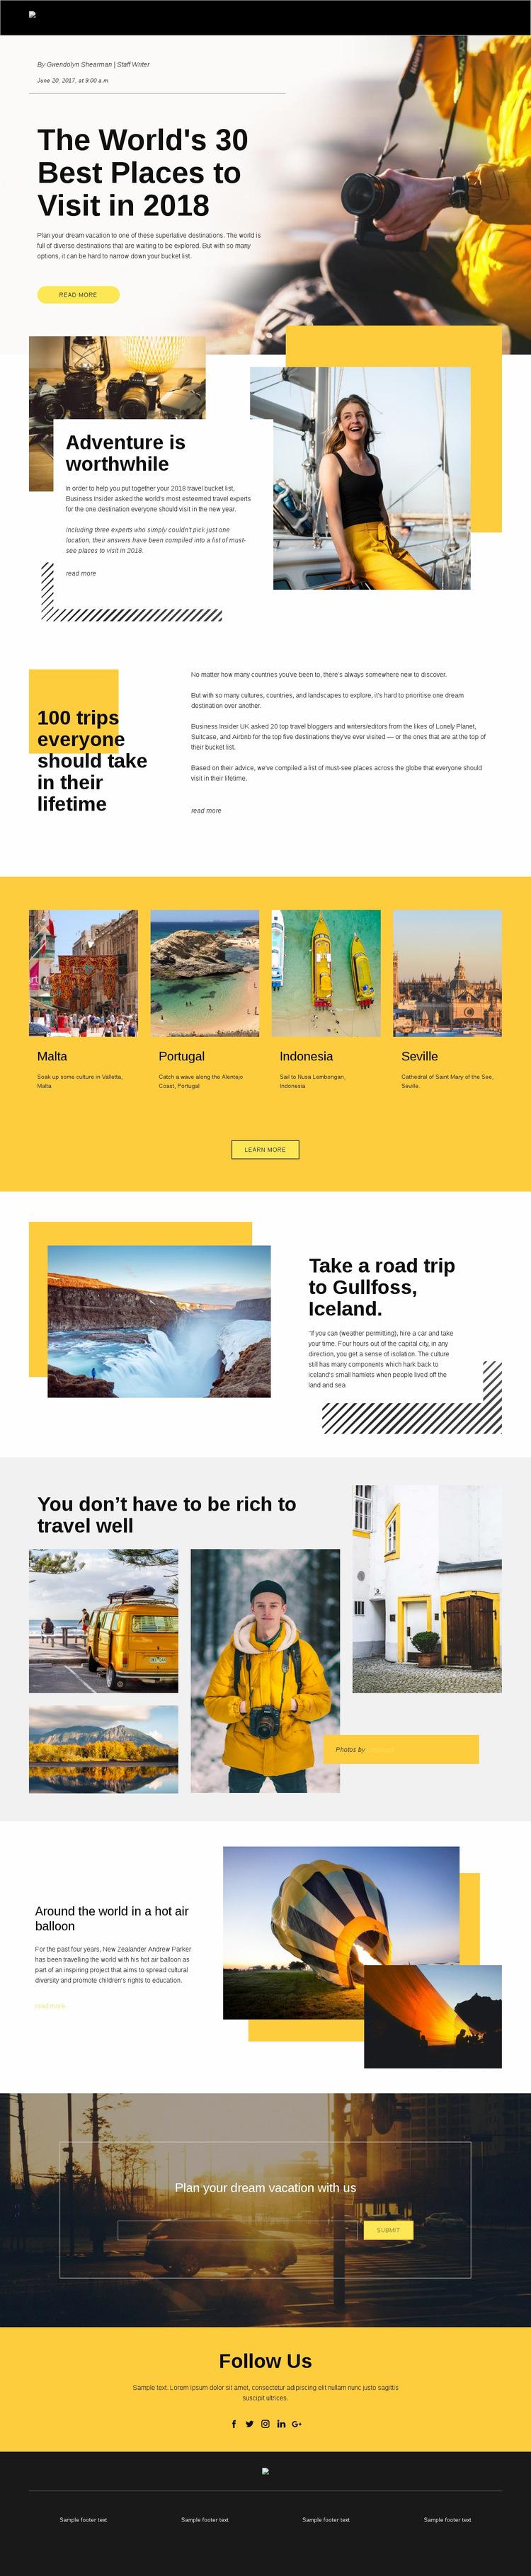 Best Places to Visit Web Page Design